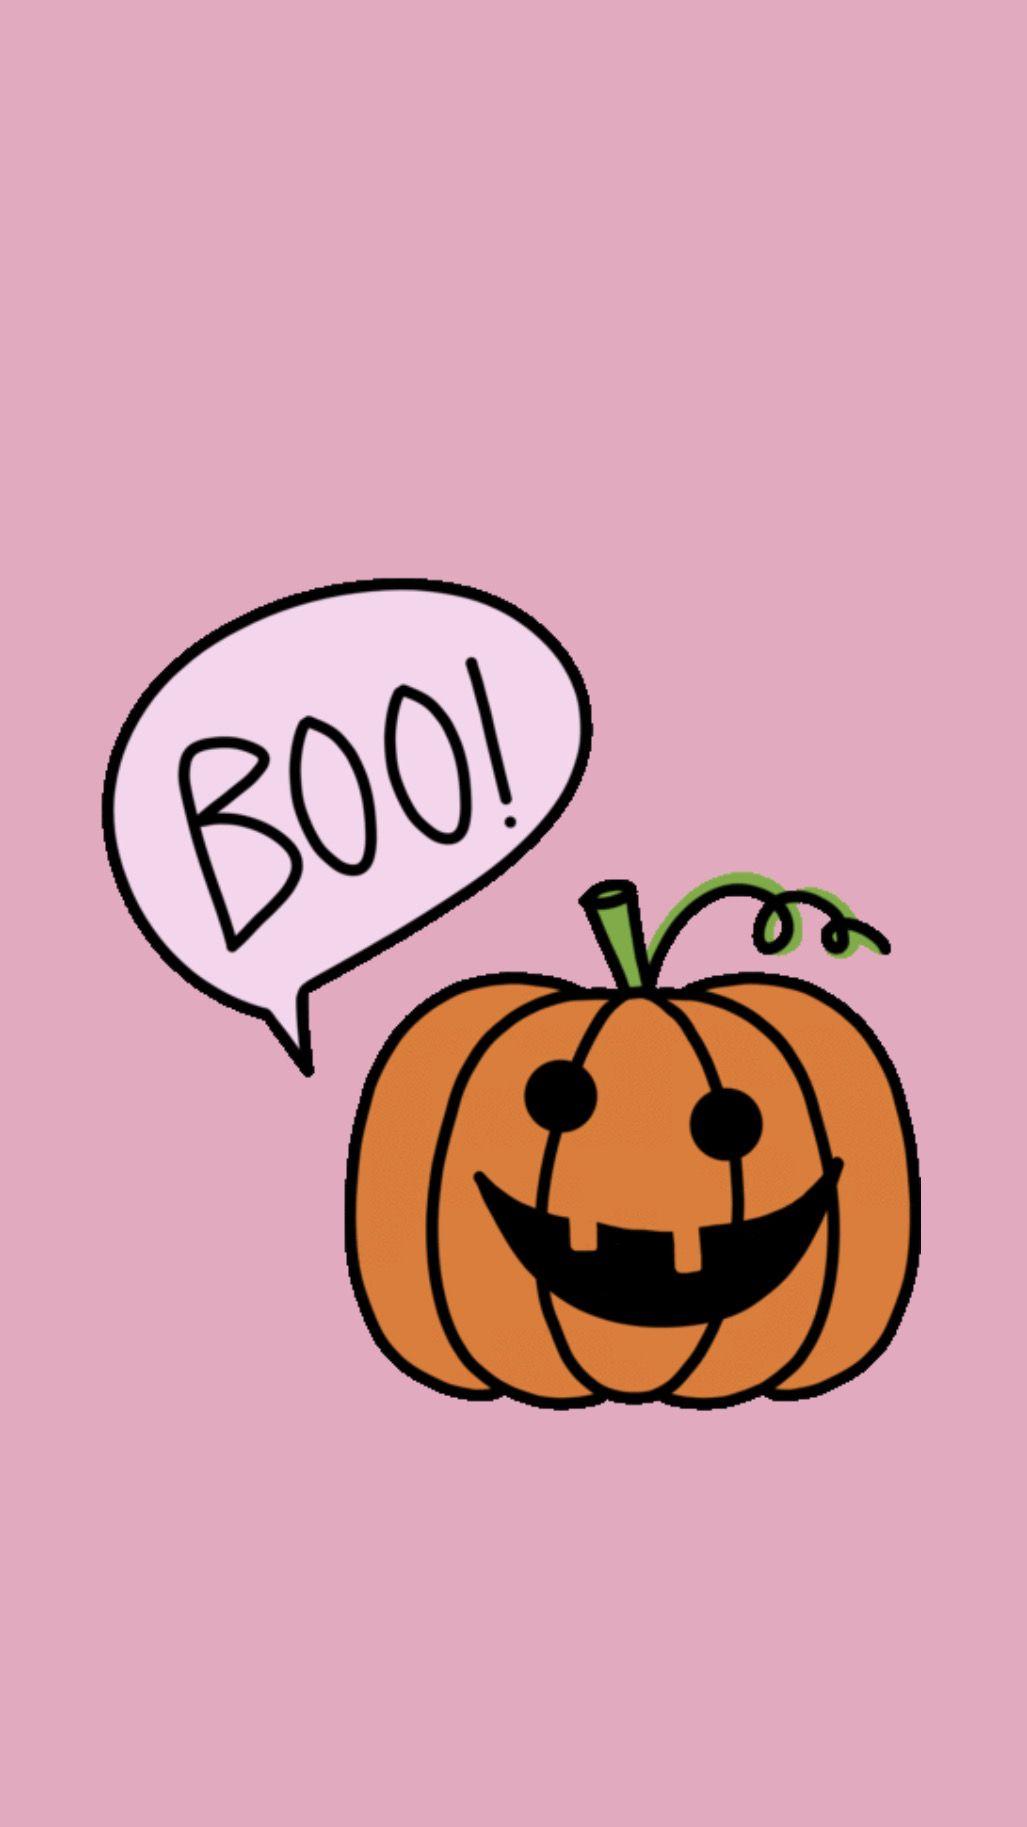 Cute Halloween Desktop Wallpapers Pumpkin Wallpaper Halloween Desktop Wallpaper Halloween Wallpaper Iphone